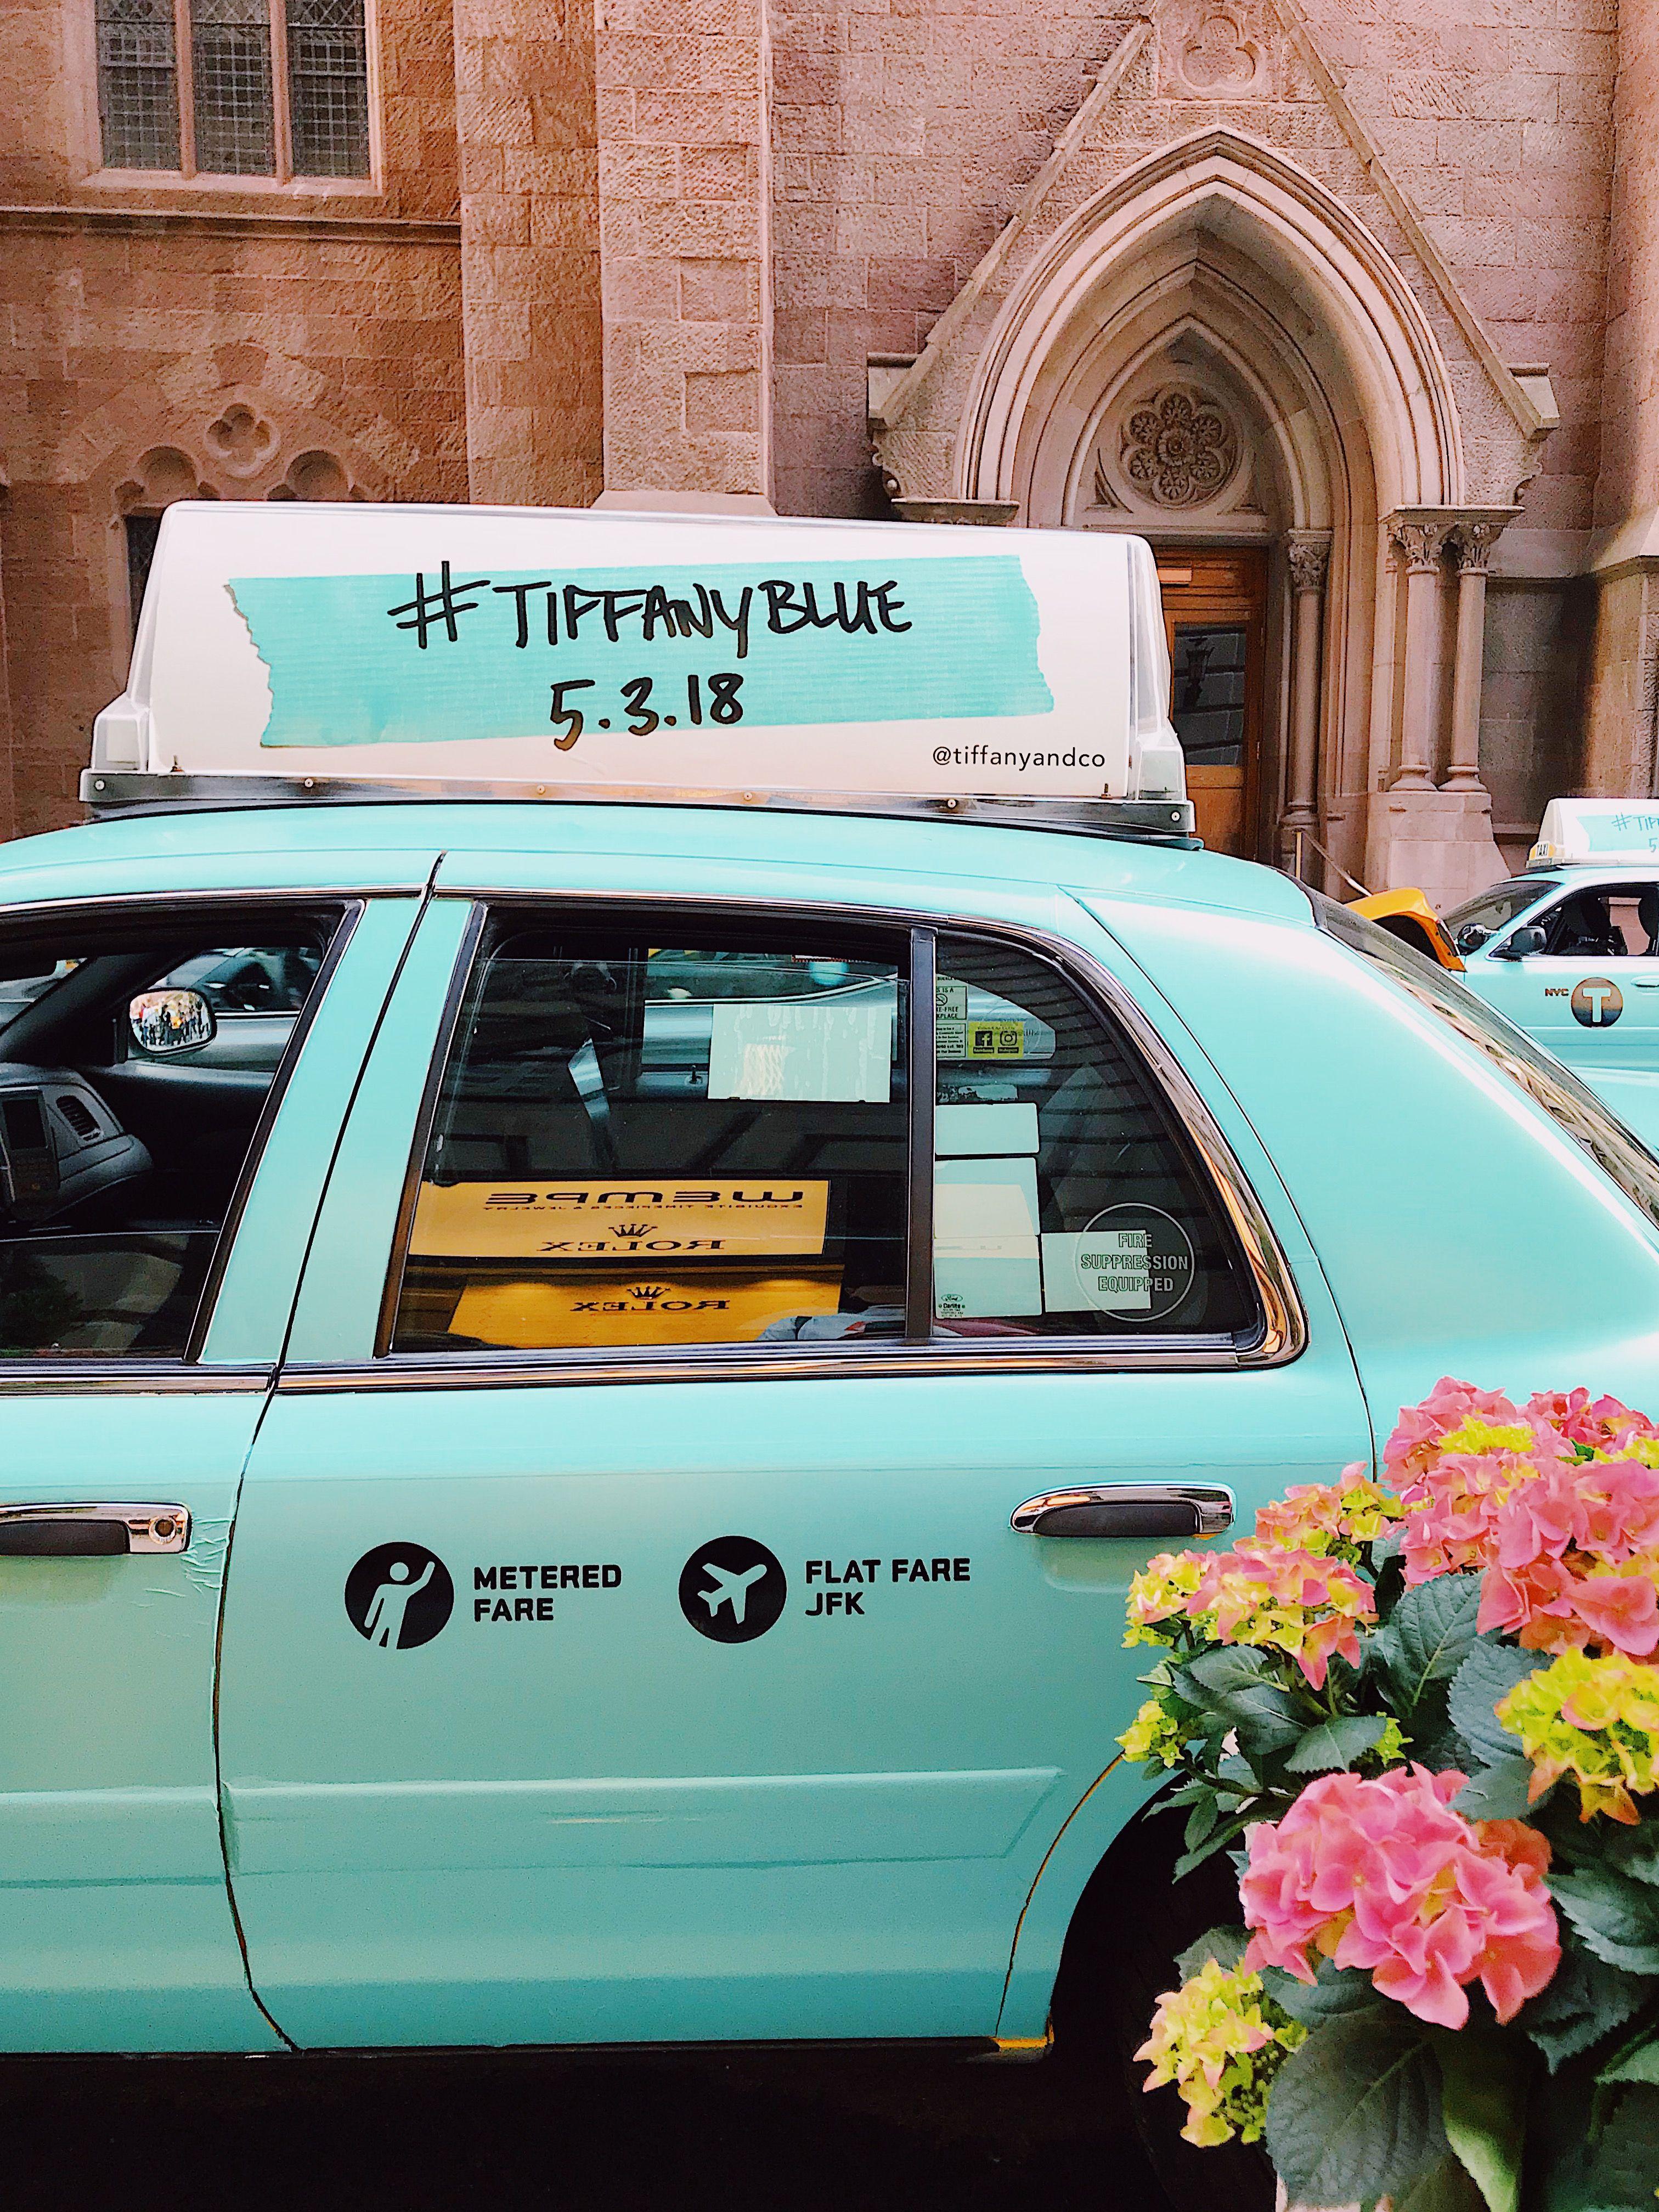 Tiffany & Co. Tiffany珠寶, 紐約